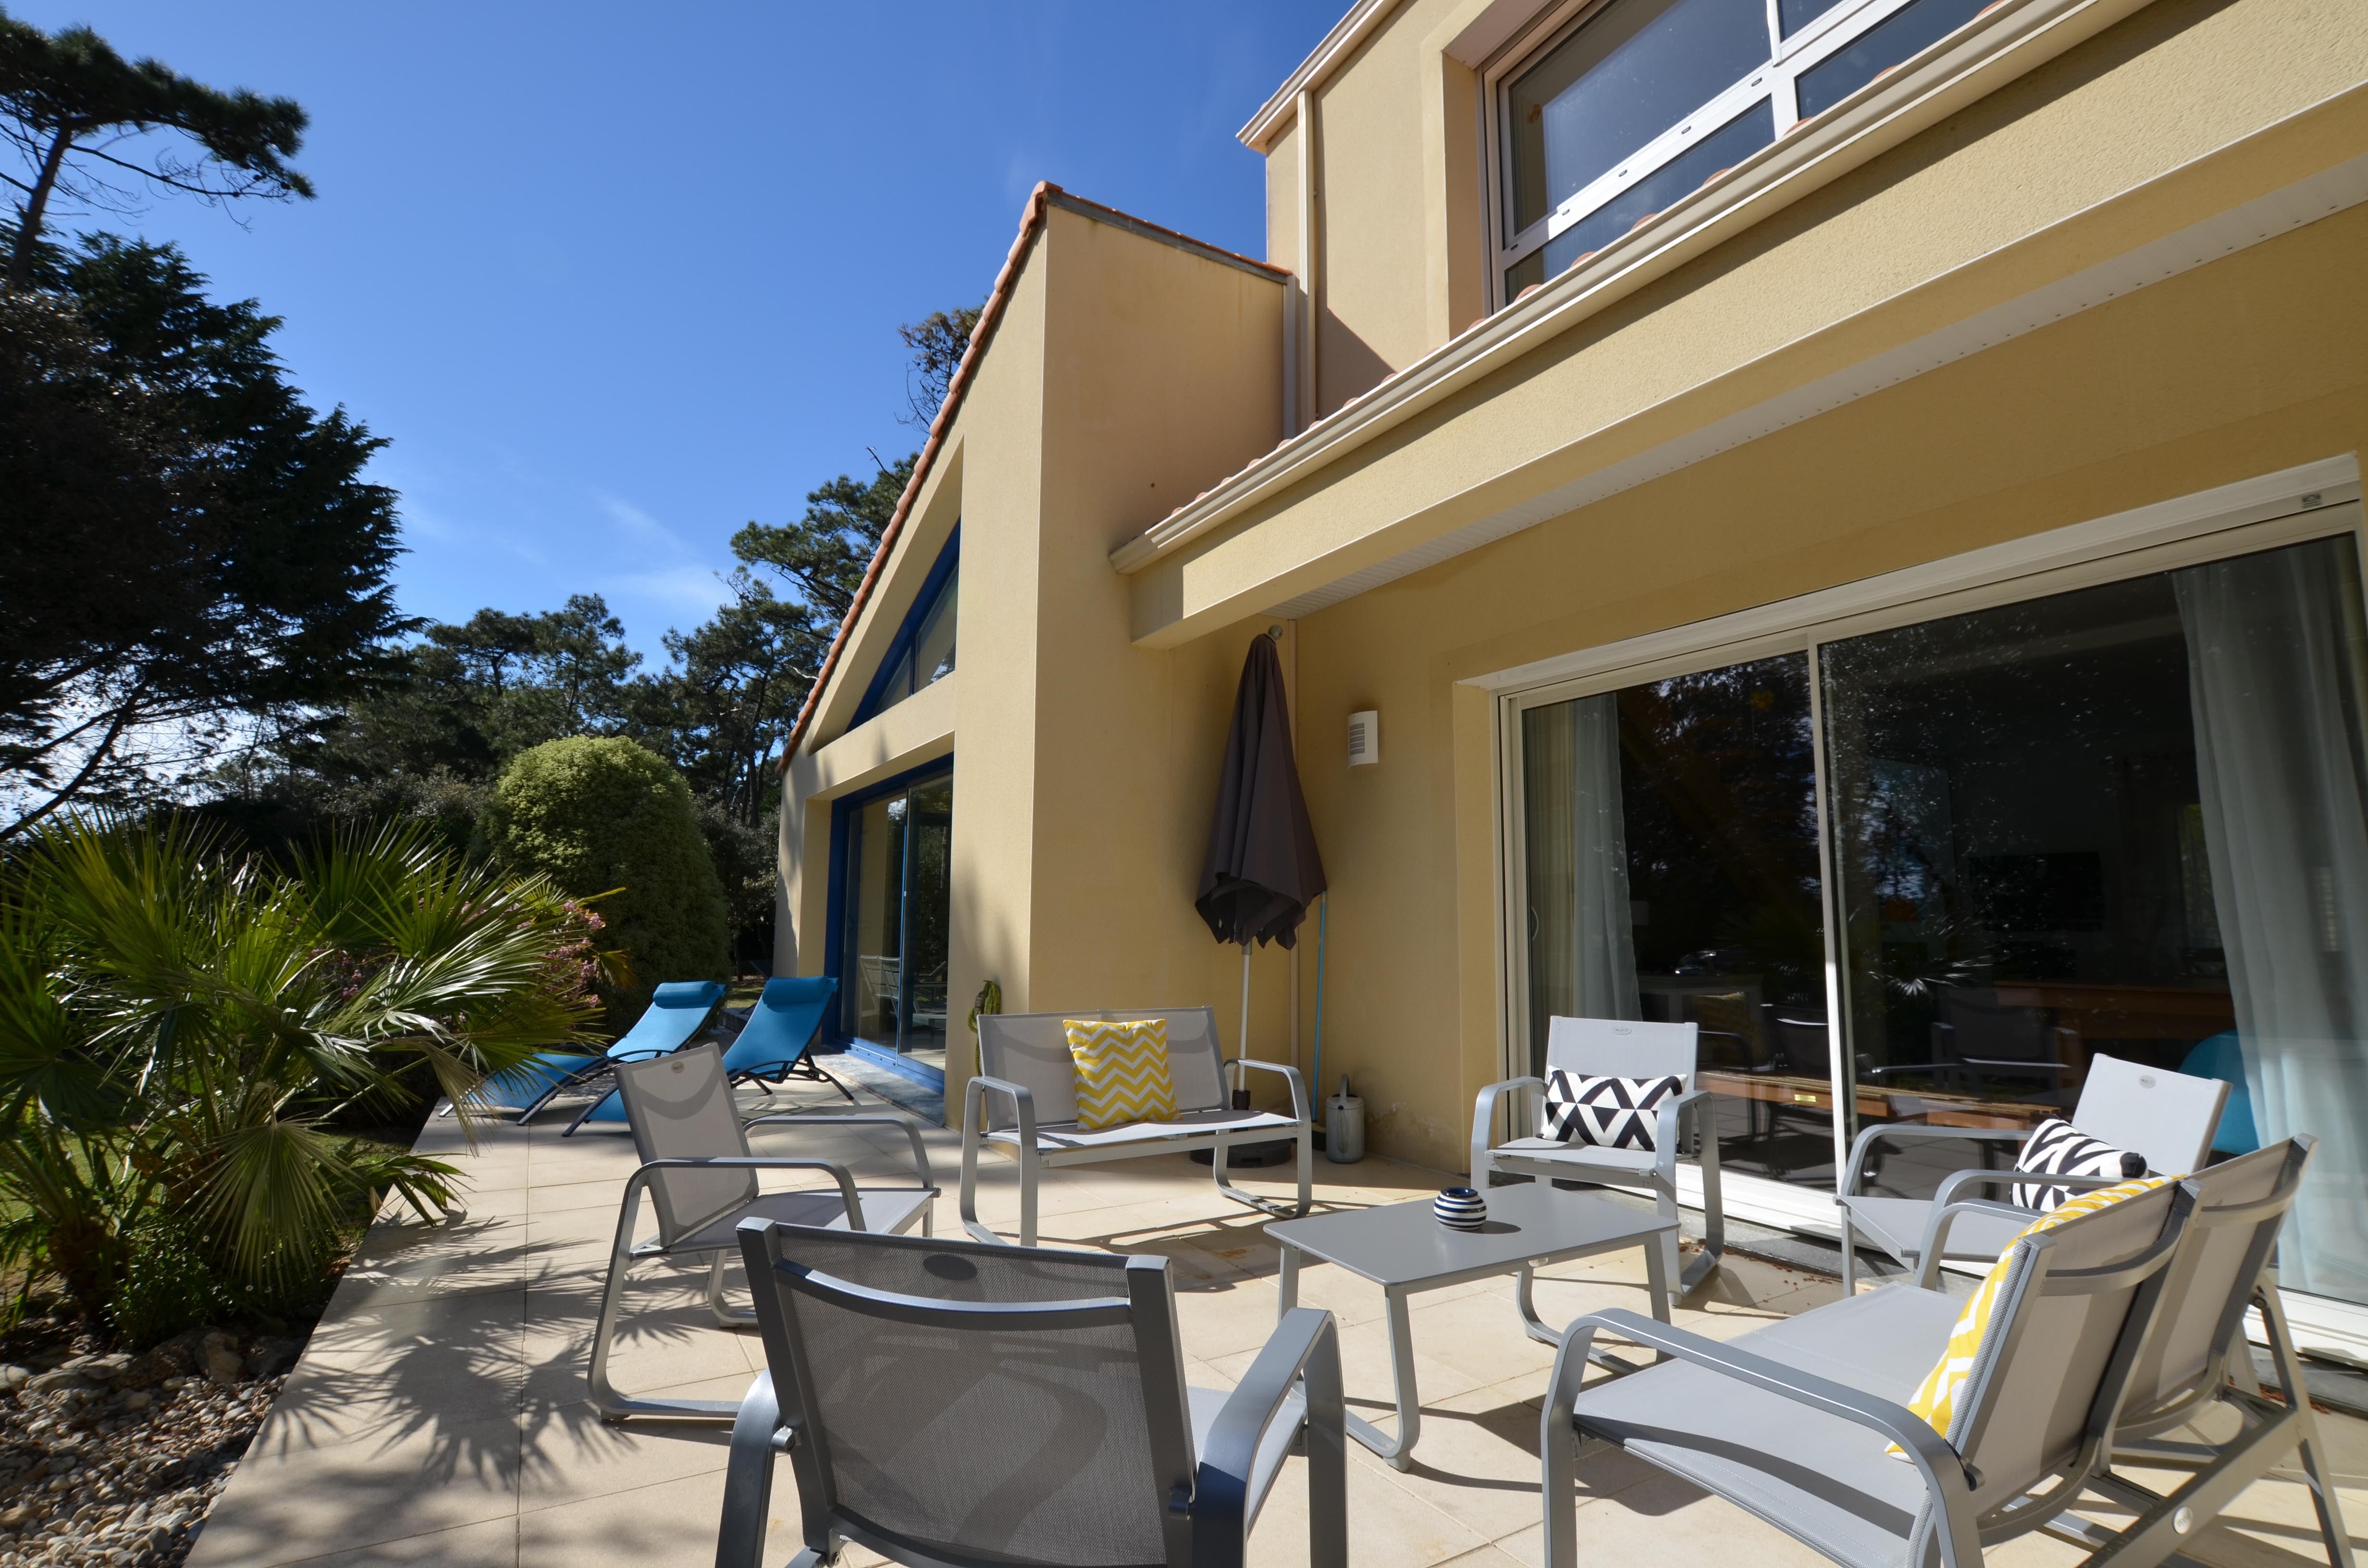 Terrasse Villa Eden Gite piscine intérieure